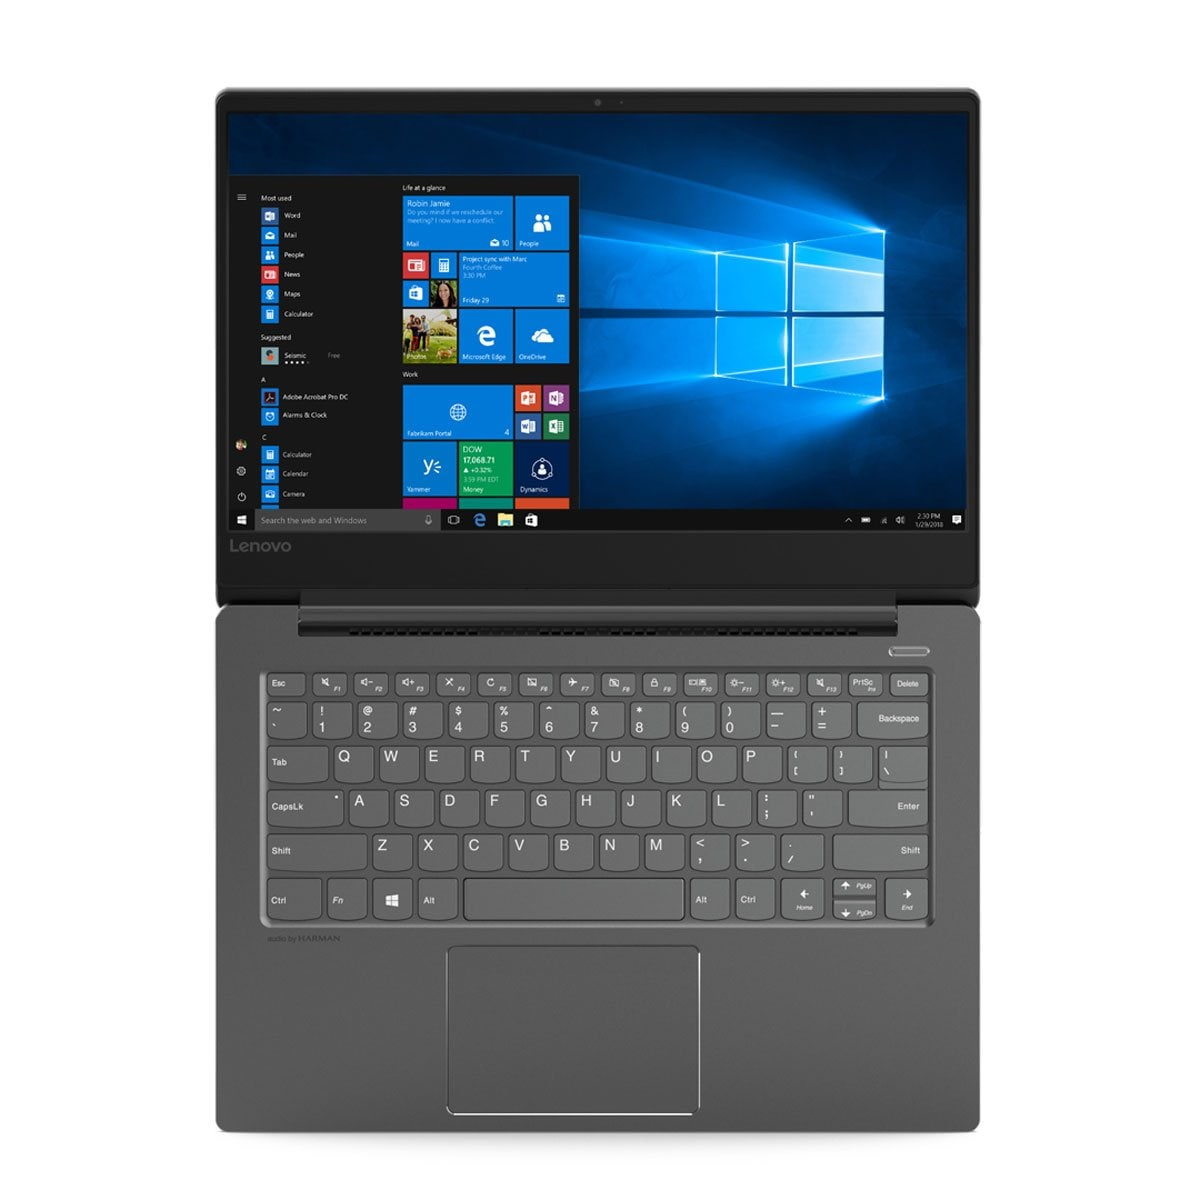 Laptop Lenovo Ideapad 530S-14Ikb I5 8G 256G 10H